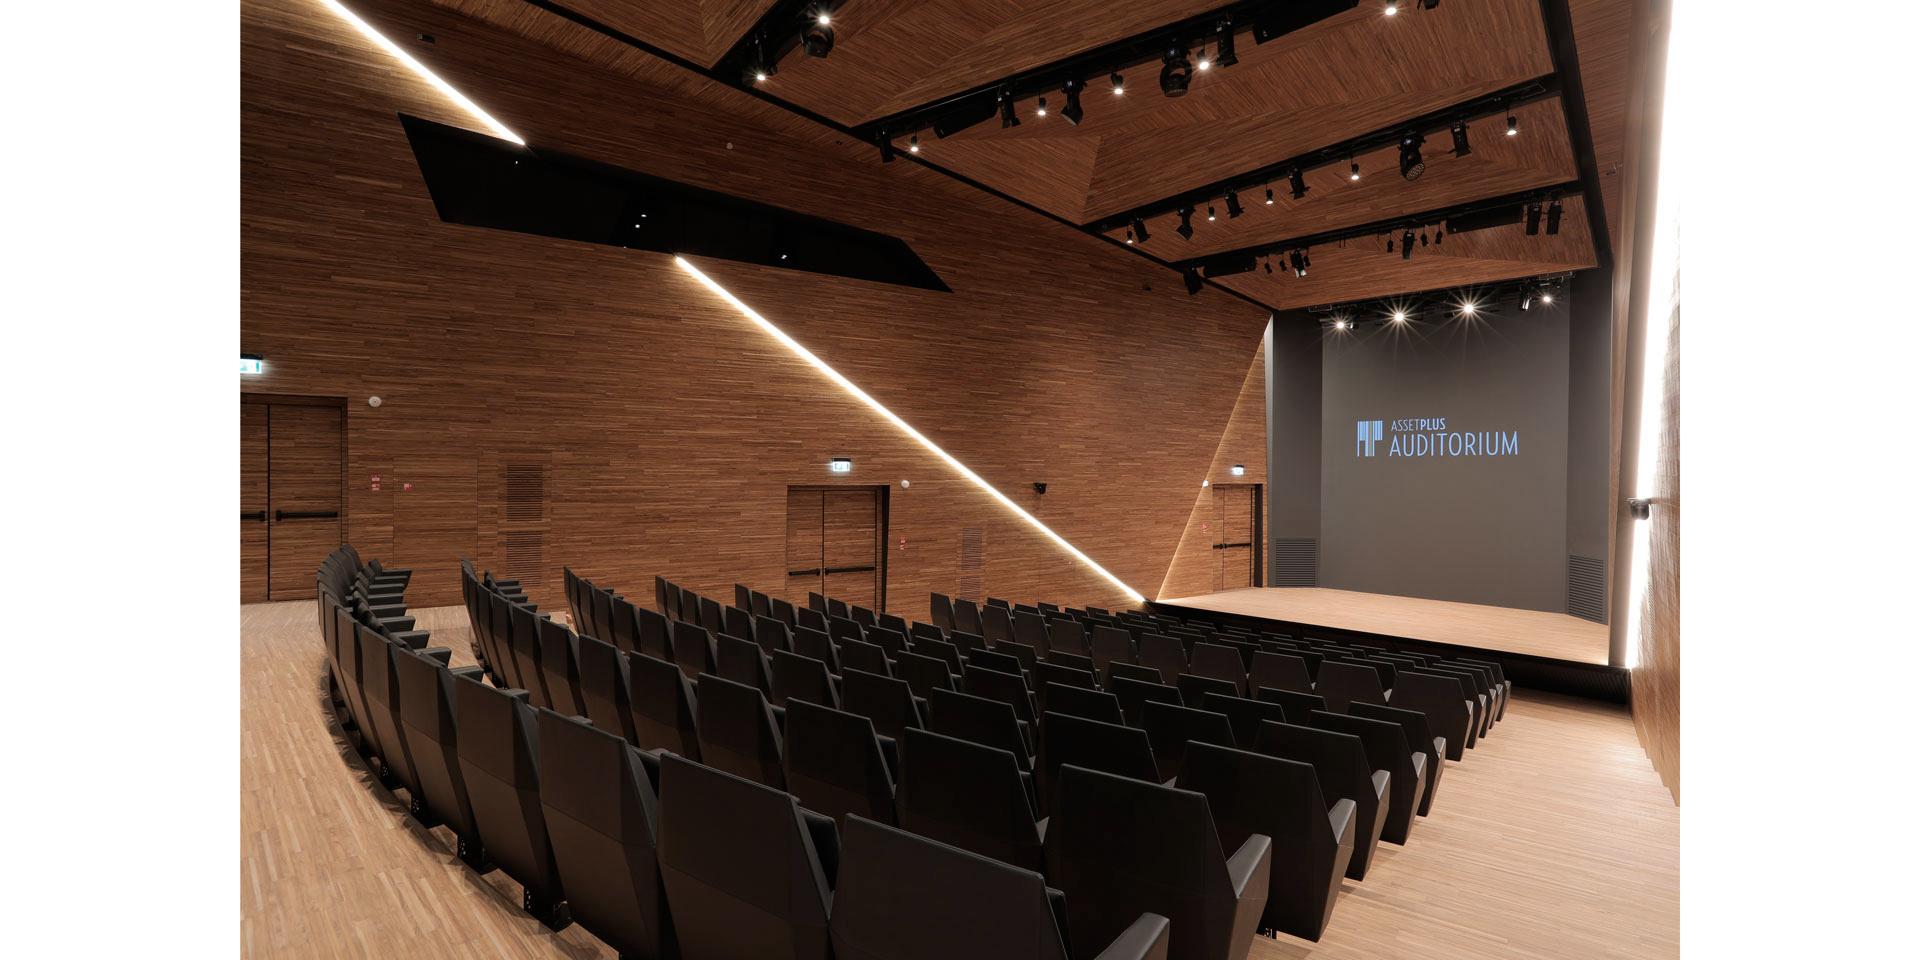 archinow_ADT_auditorium-asset-bank-04